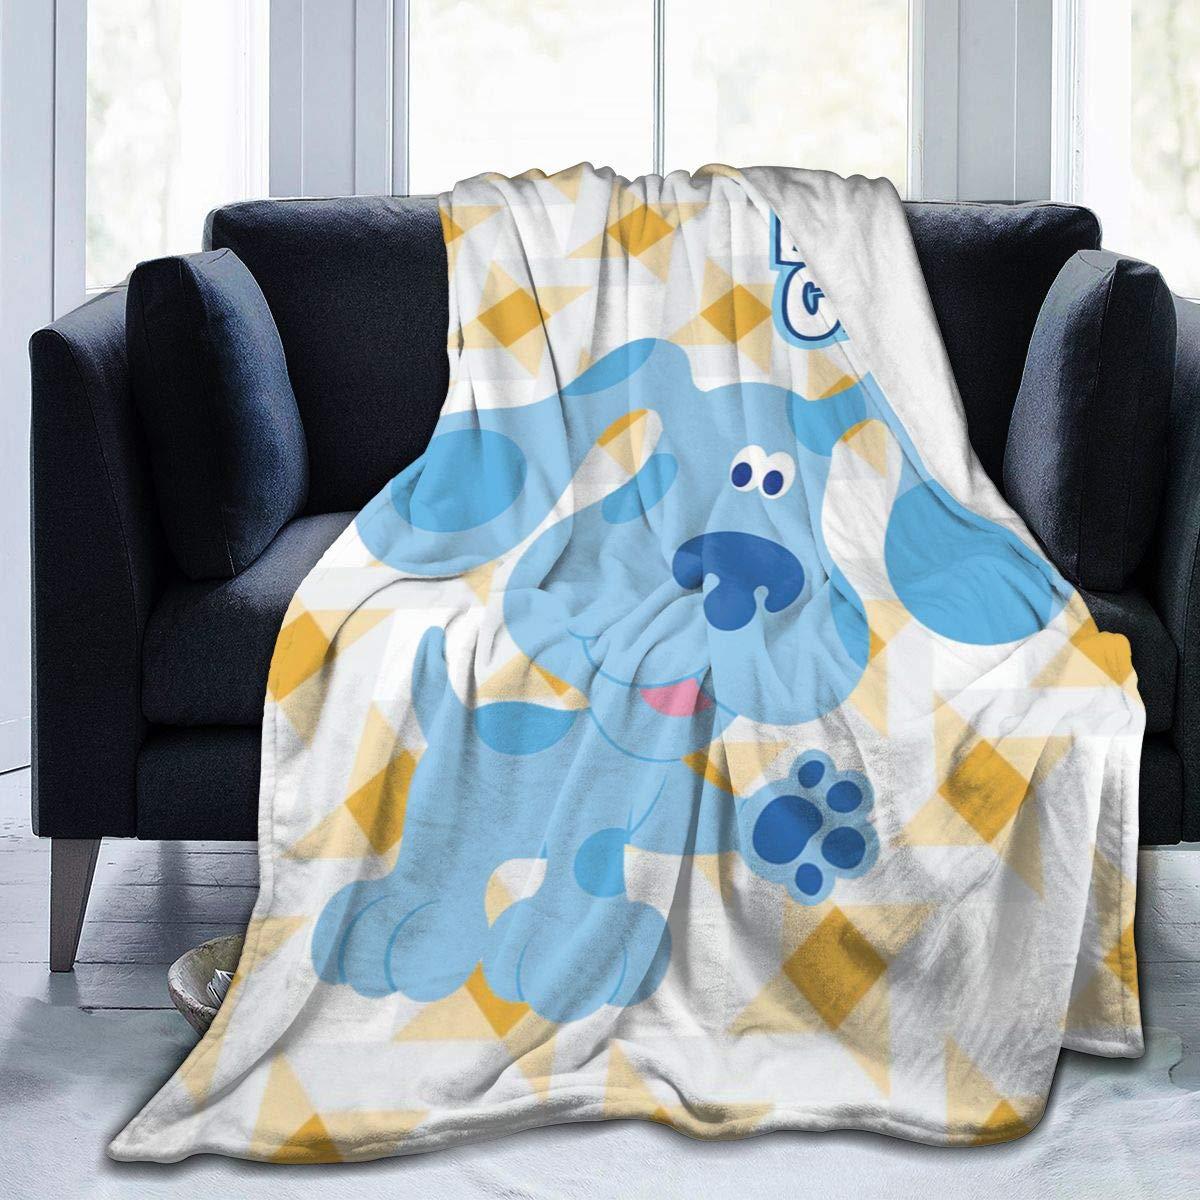 "SuperLee Children's Blue's Clues Dog Flannel Blanket Warm Throw Blanket 50"""" x40 Large Soft Blanket"